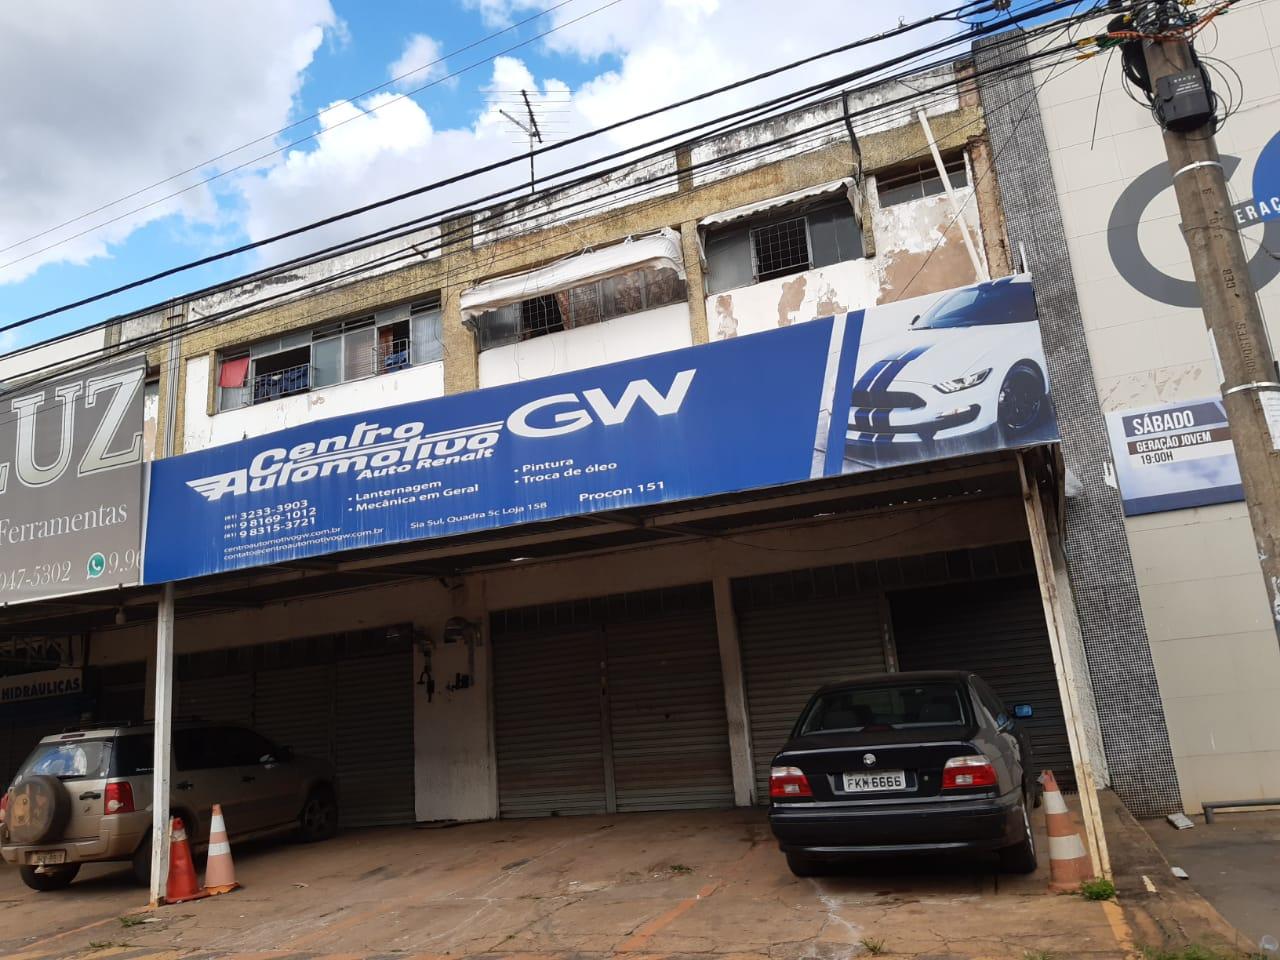 GW, Centro Automotivo, SIA Trecho 5C, Comercio Brasilia